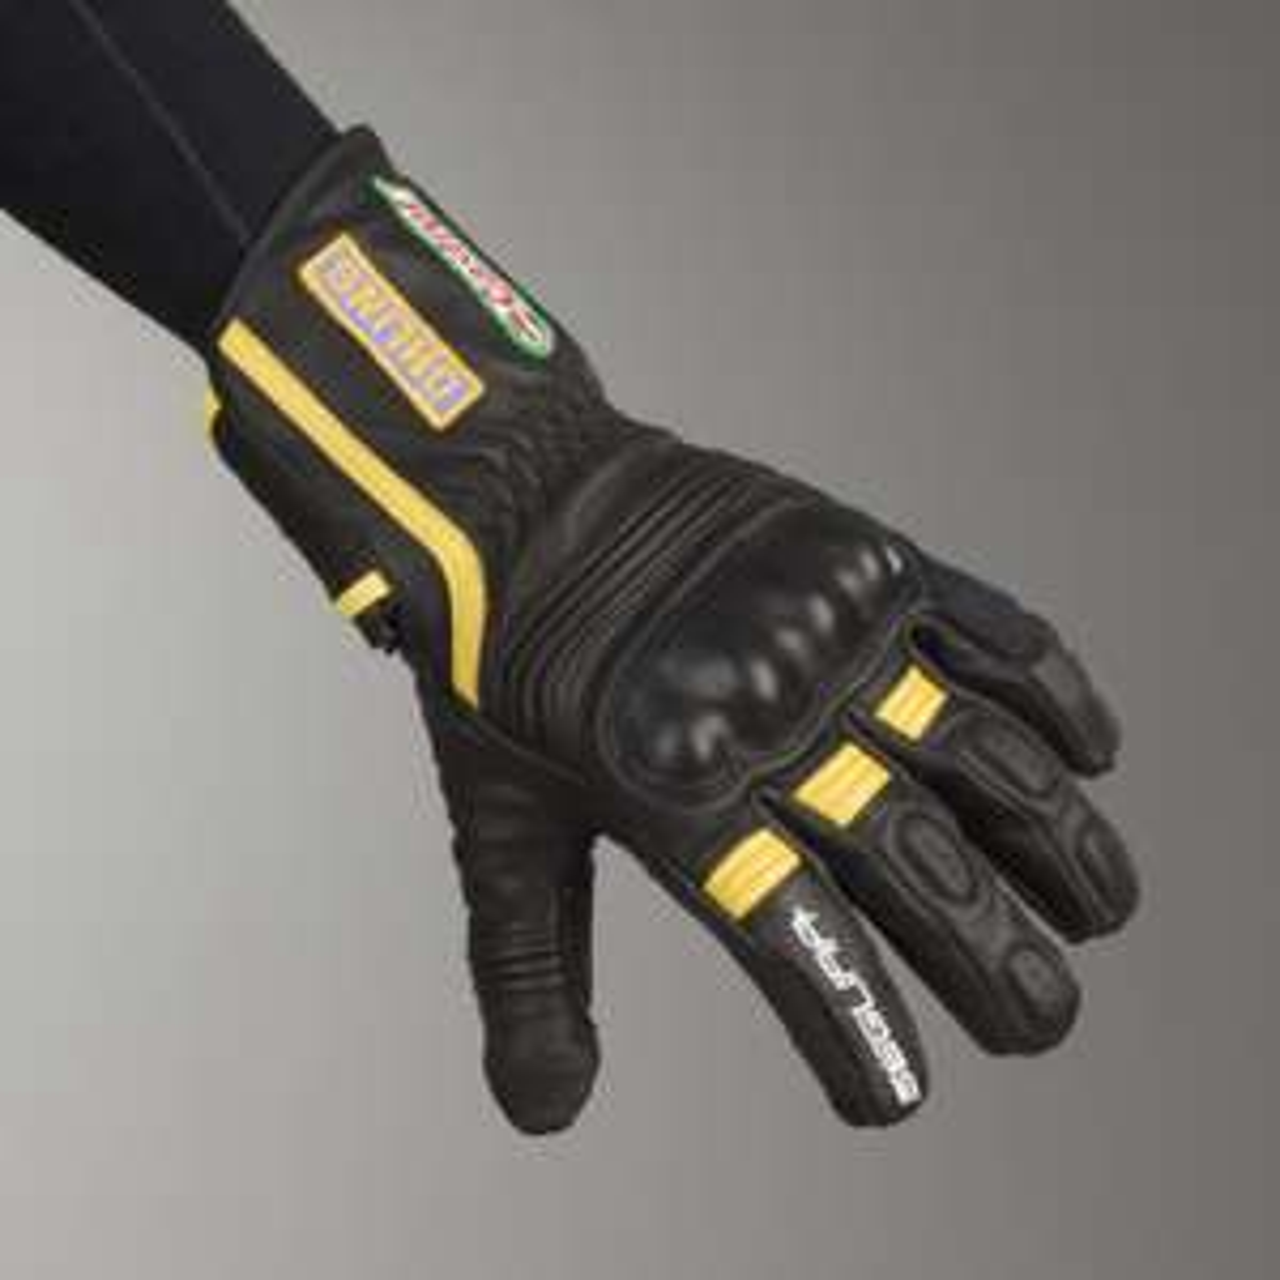 Gants de moto Segura Apache - noir / jaune (du M au XXL)